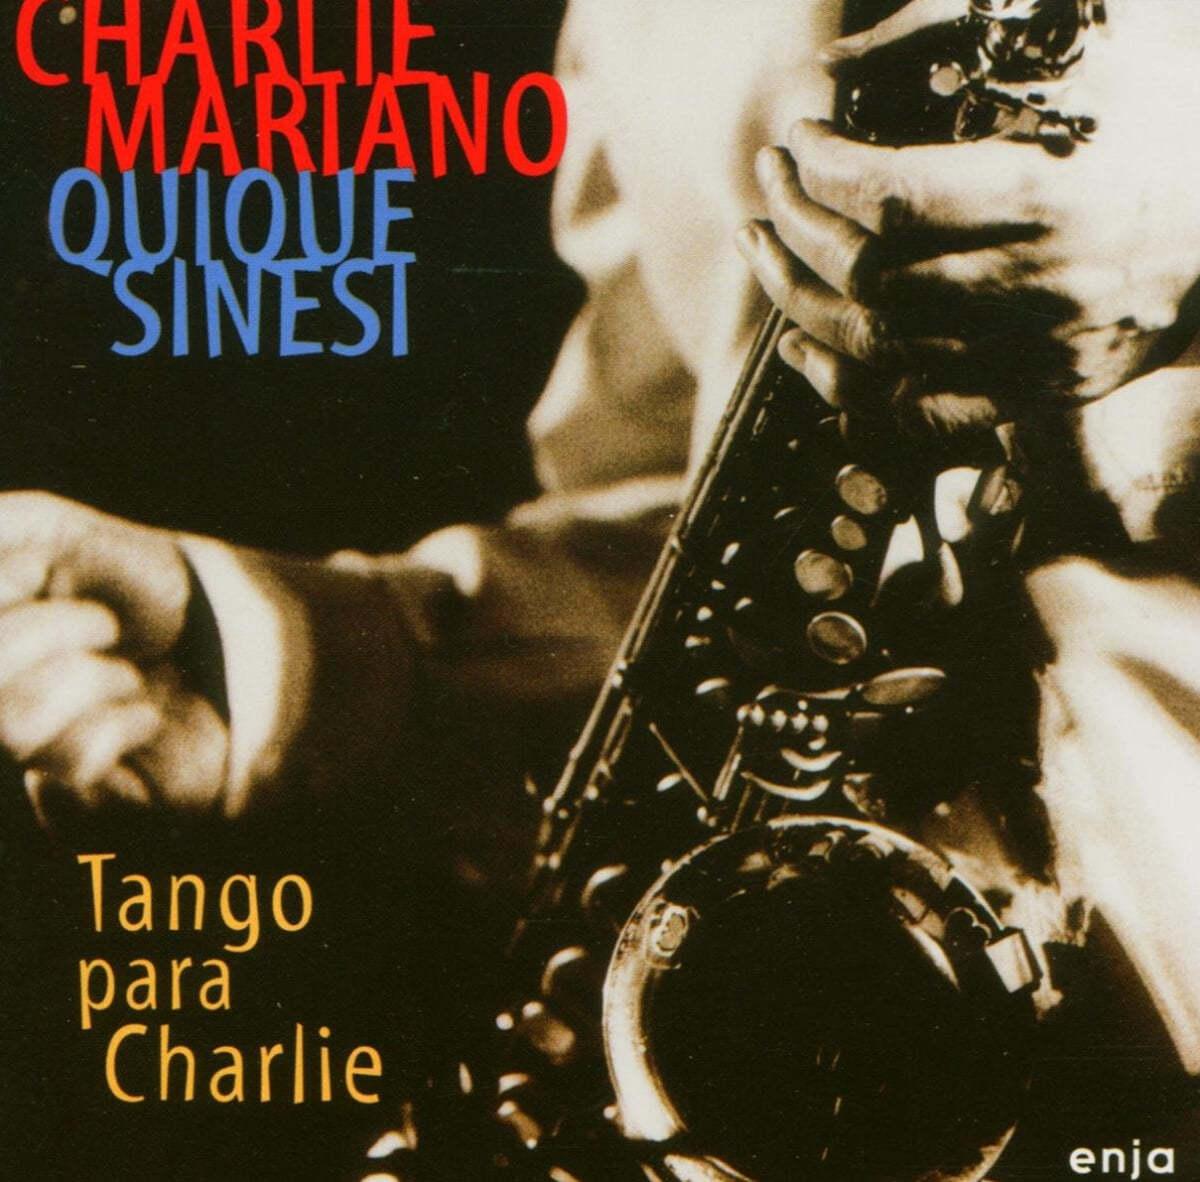 Charlie Mariano (찰리 마리아노) - Tango Para Charlie